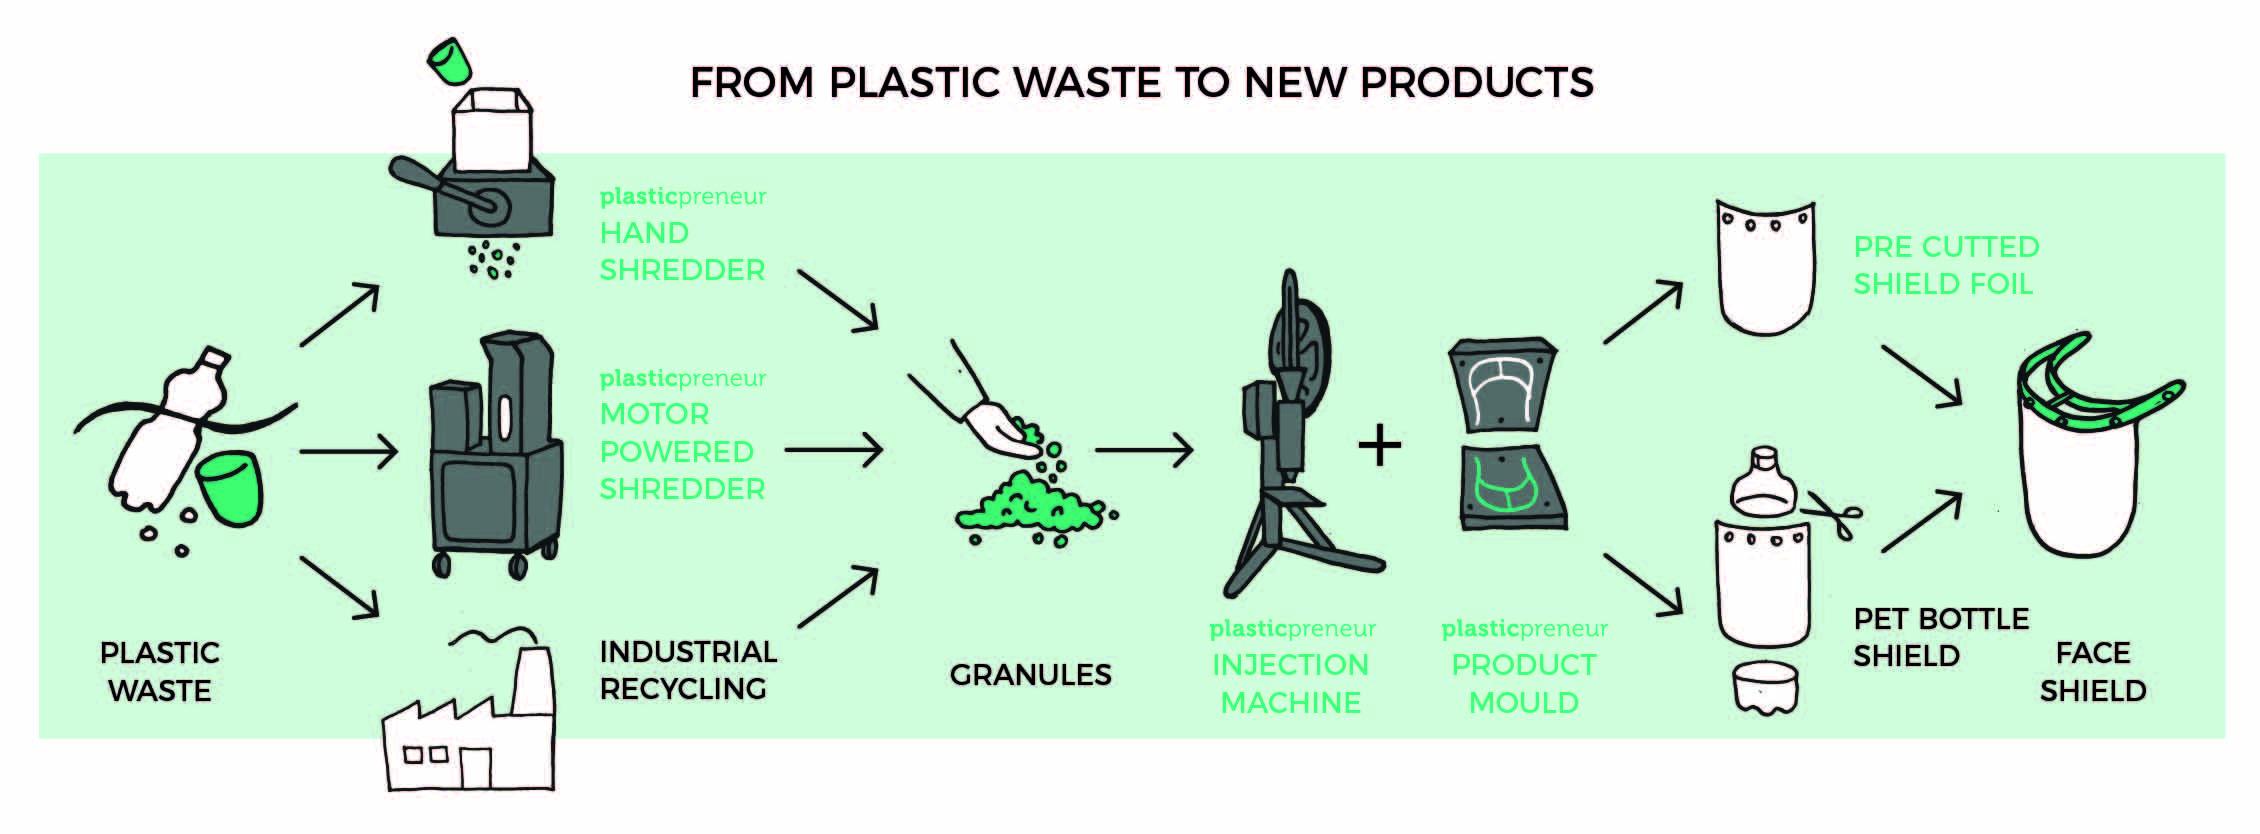 plasticpreneur: So entstehen die Face Shields aus Plastikmüll